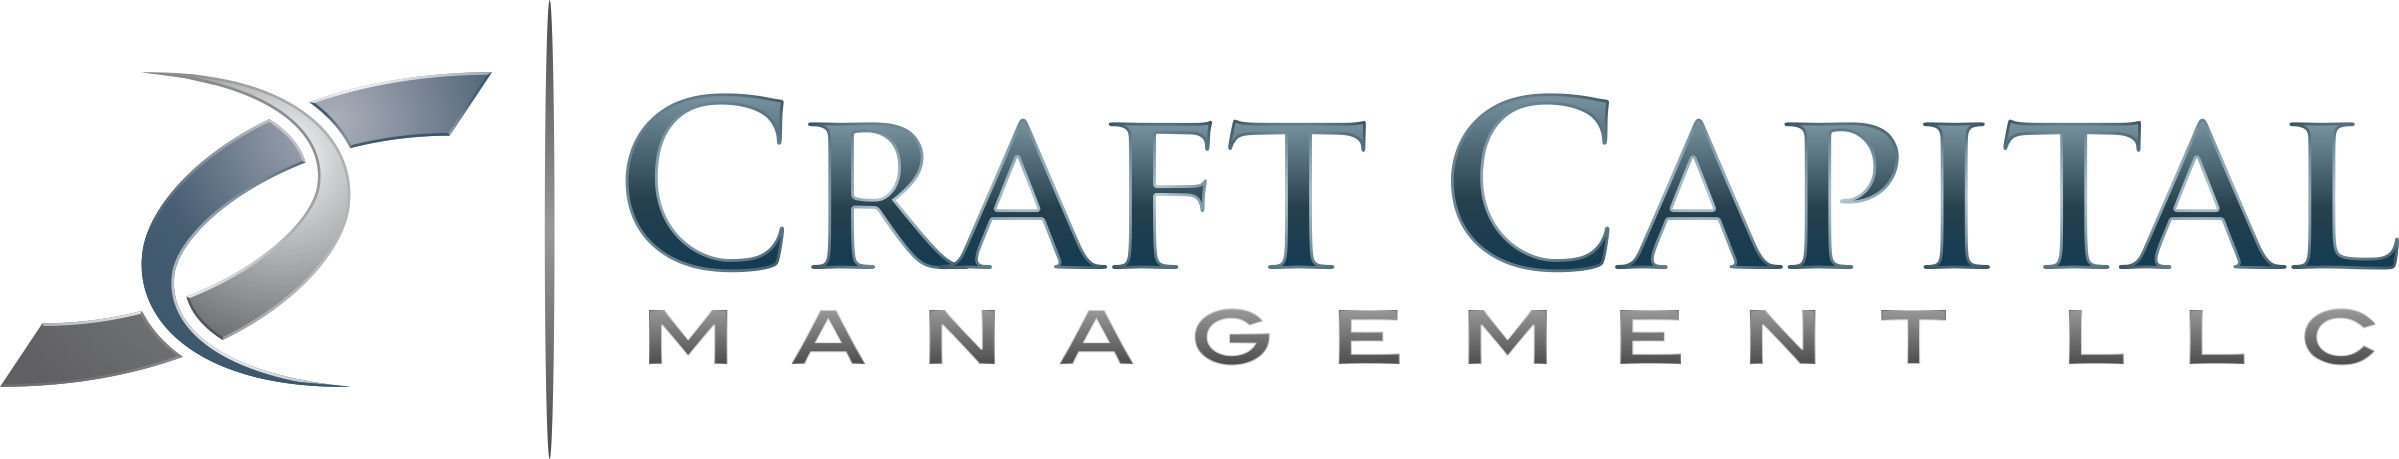 Craft Capital Management LLC